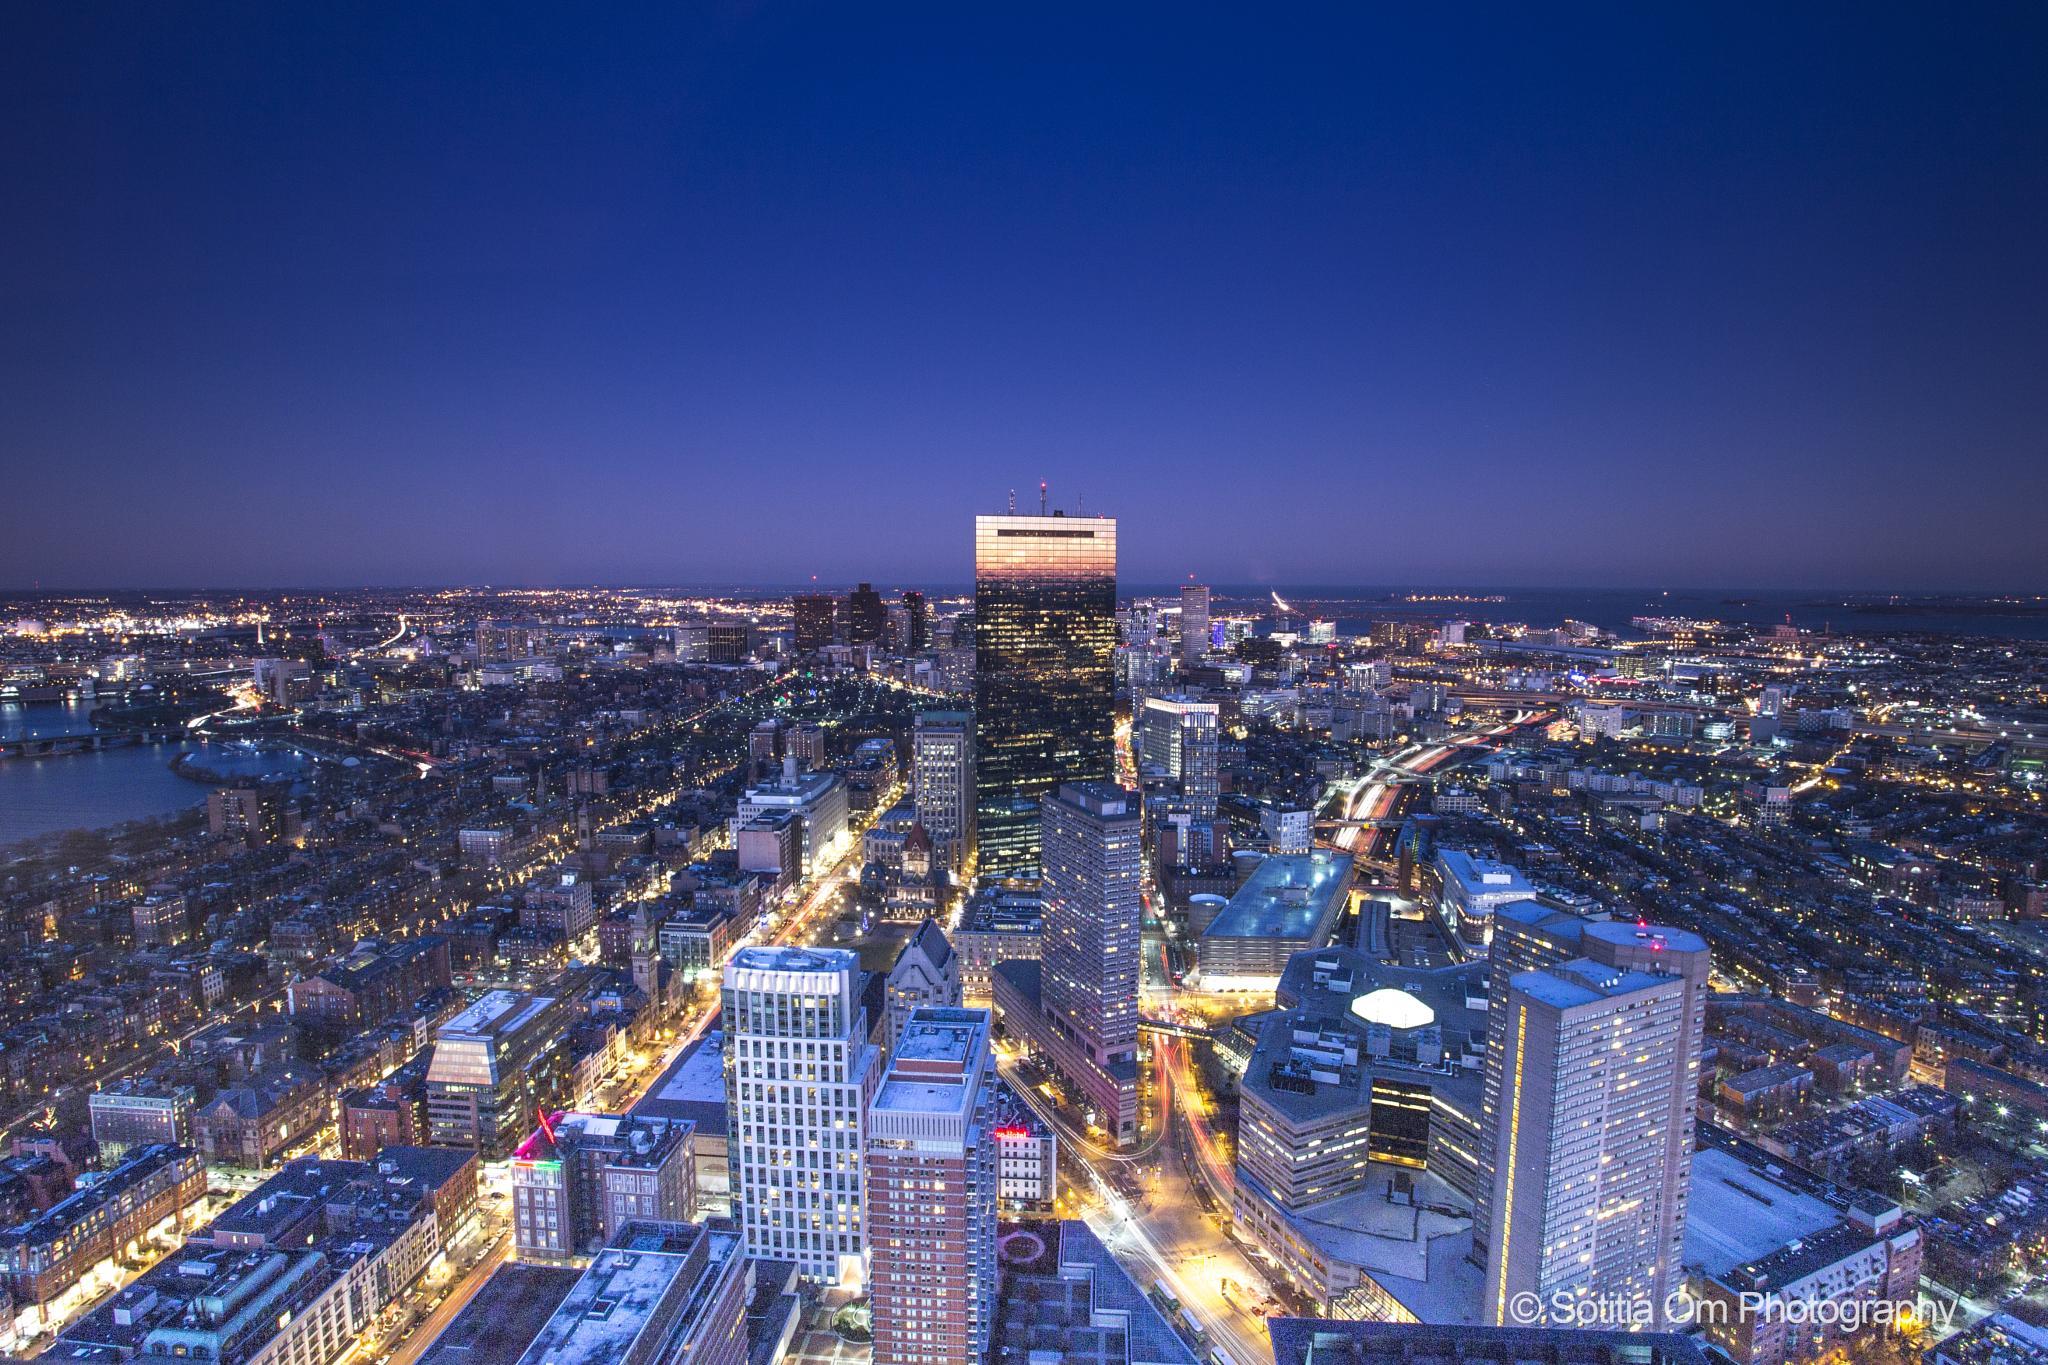 Boston Skywalk by Sotitia Om Photography